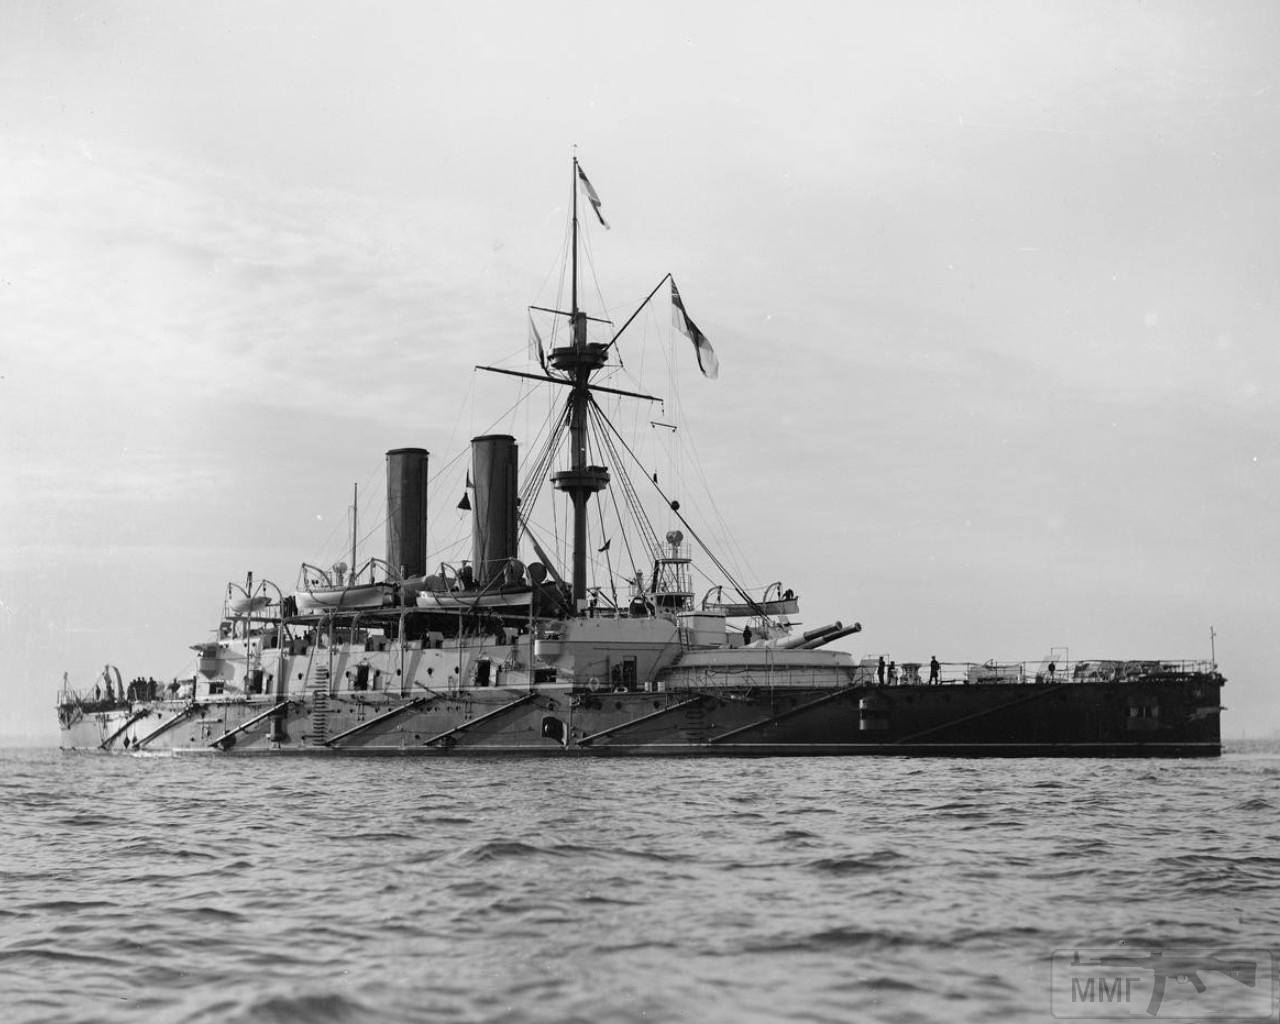 36184 - HMS Collingwood